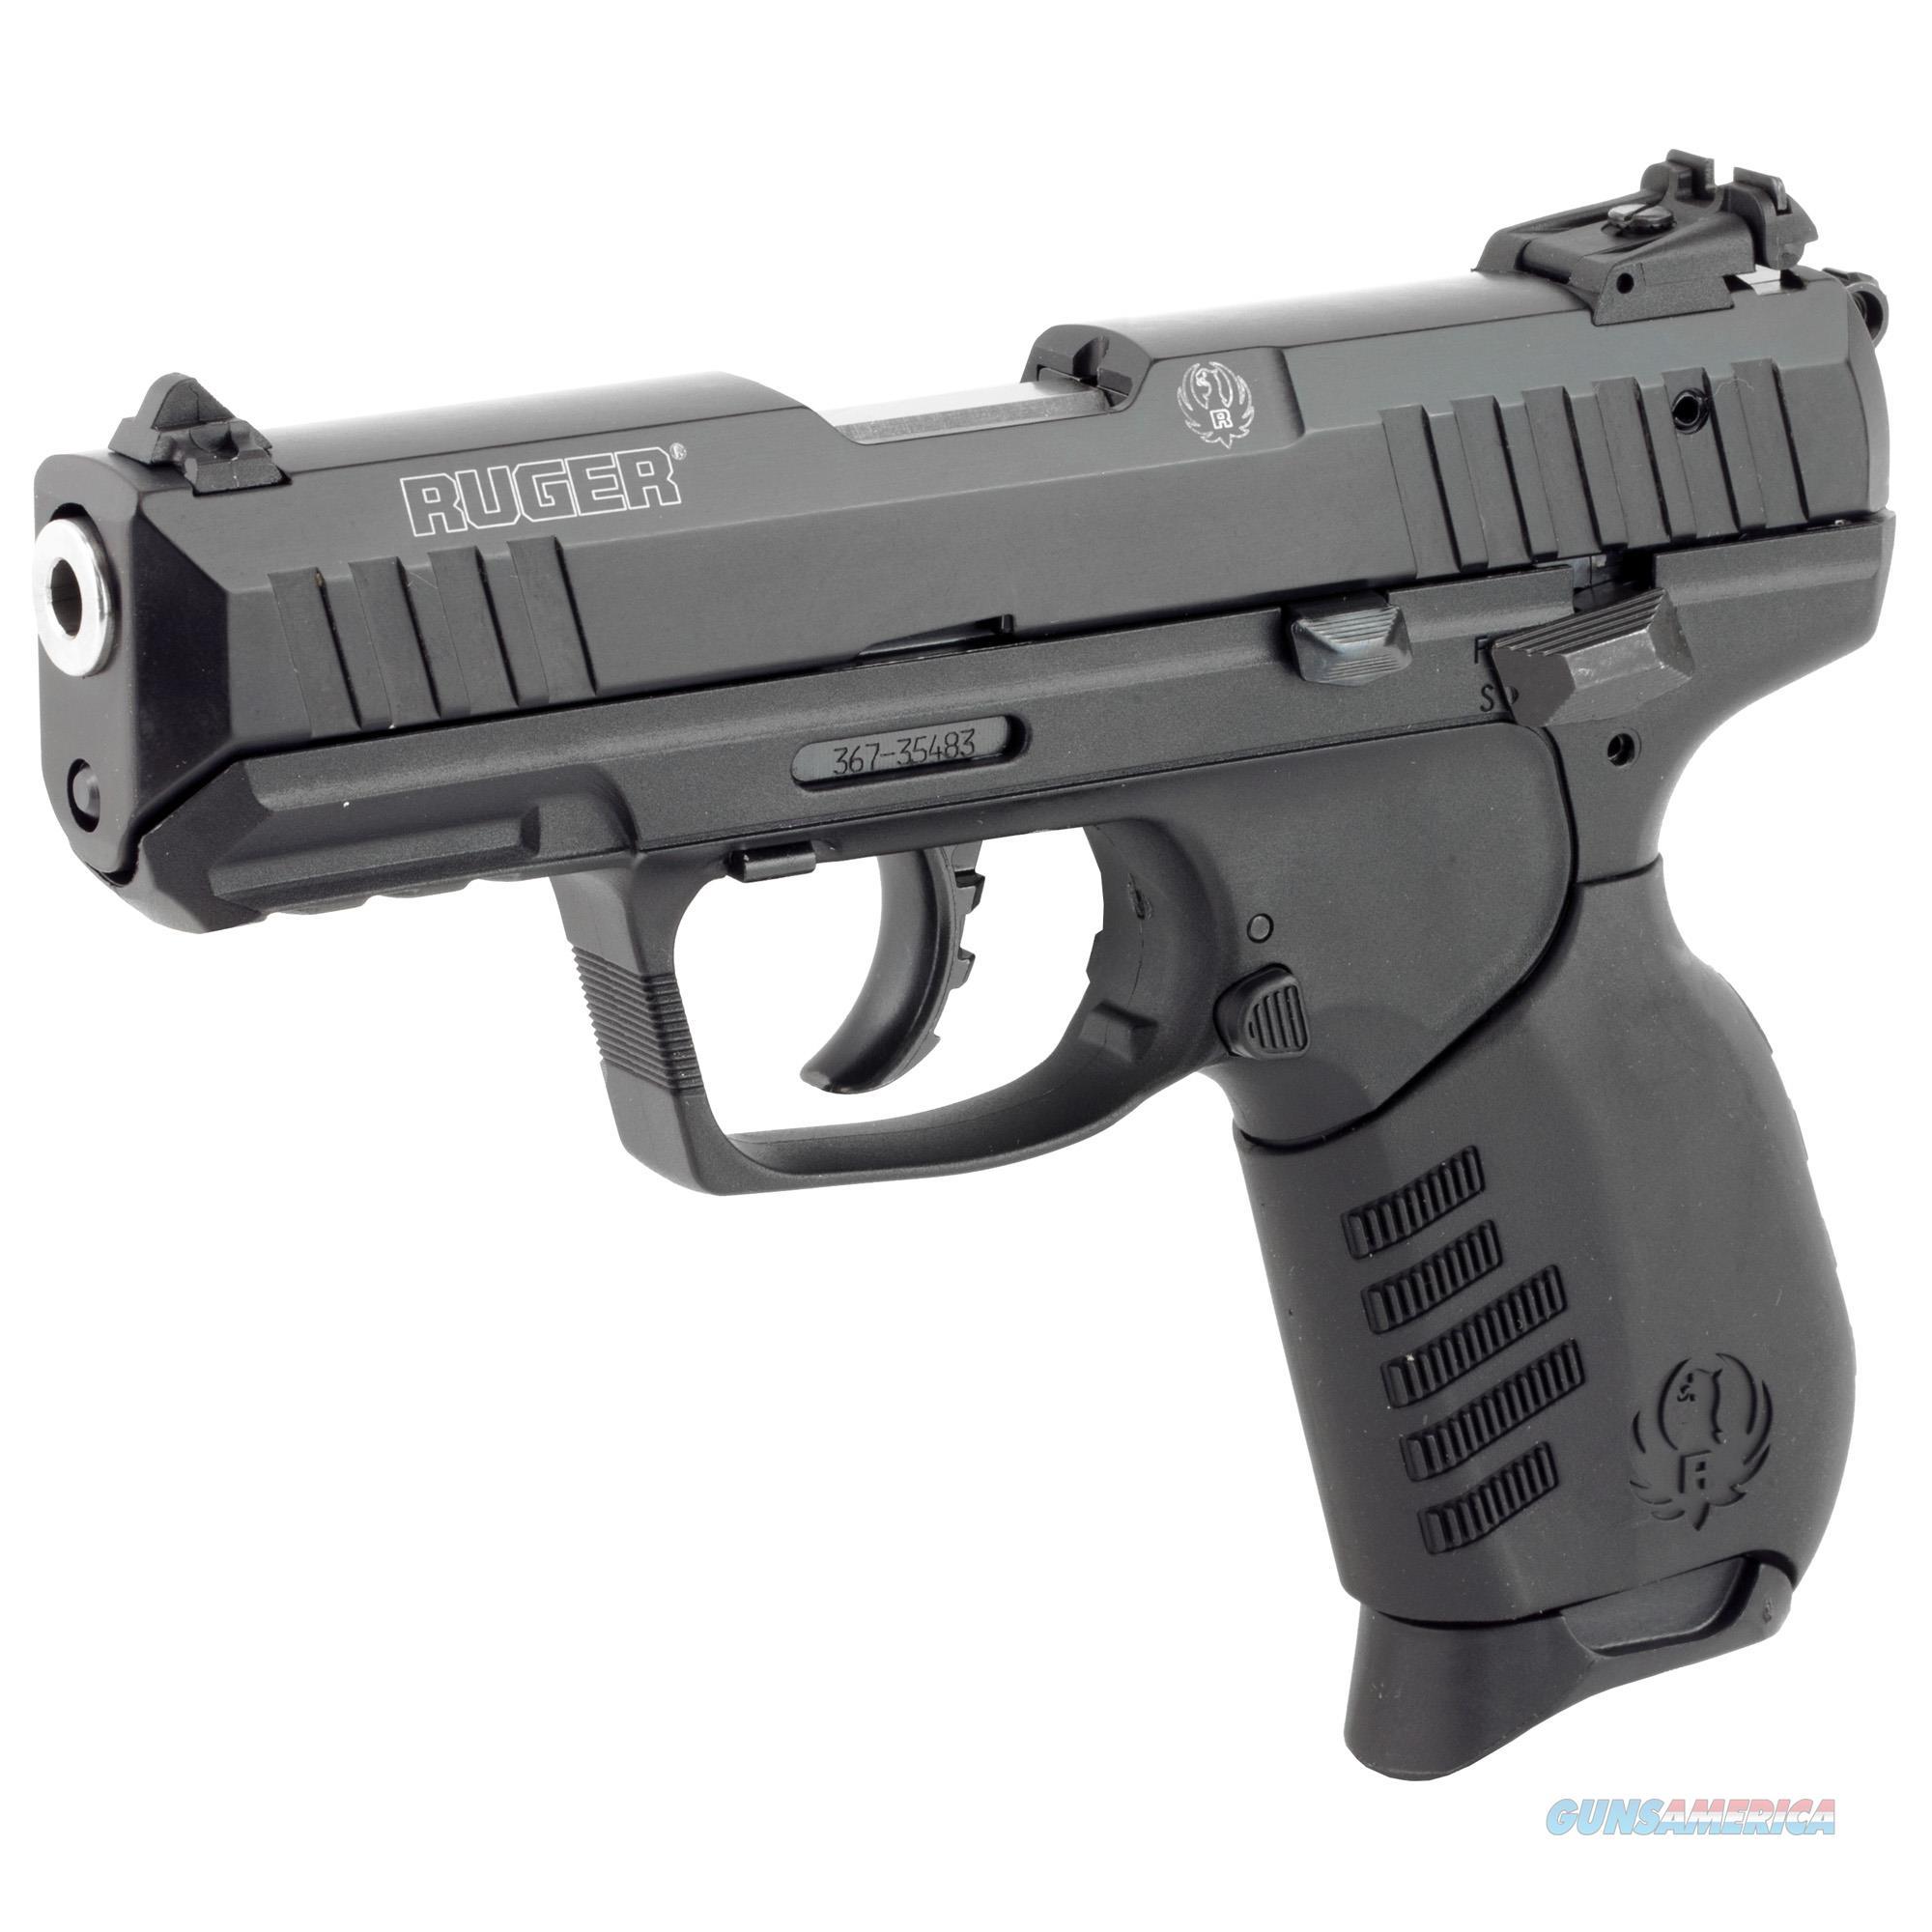 "Ruger 3600 SR22 .22LR 3.5"" 10+1 - New in Box!  Guns > Pistols > Ruger Semi-Auto Pistols > SR Family > SR22"